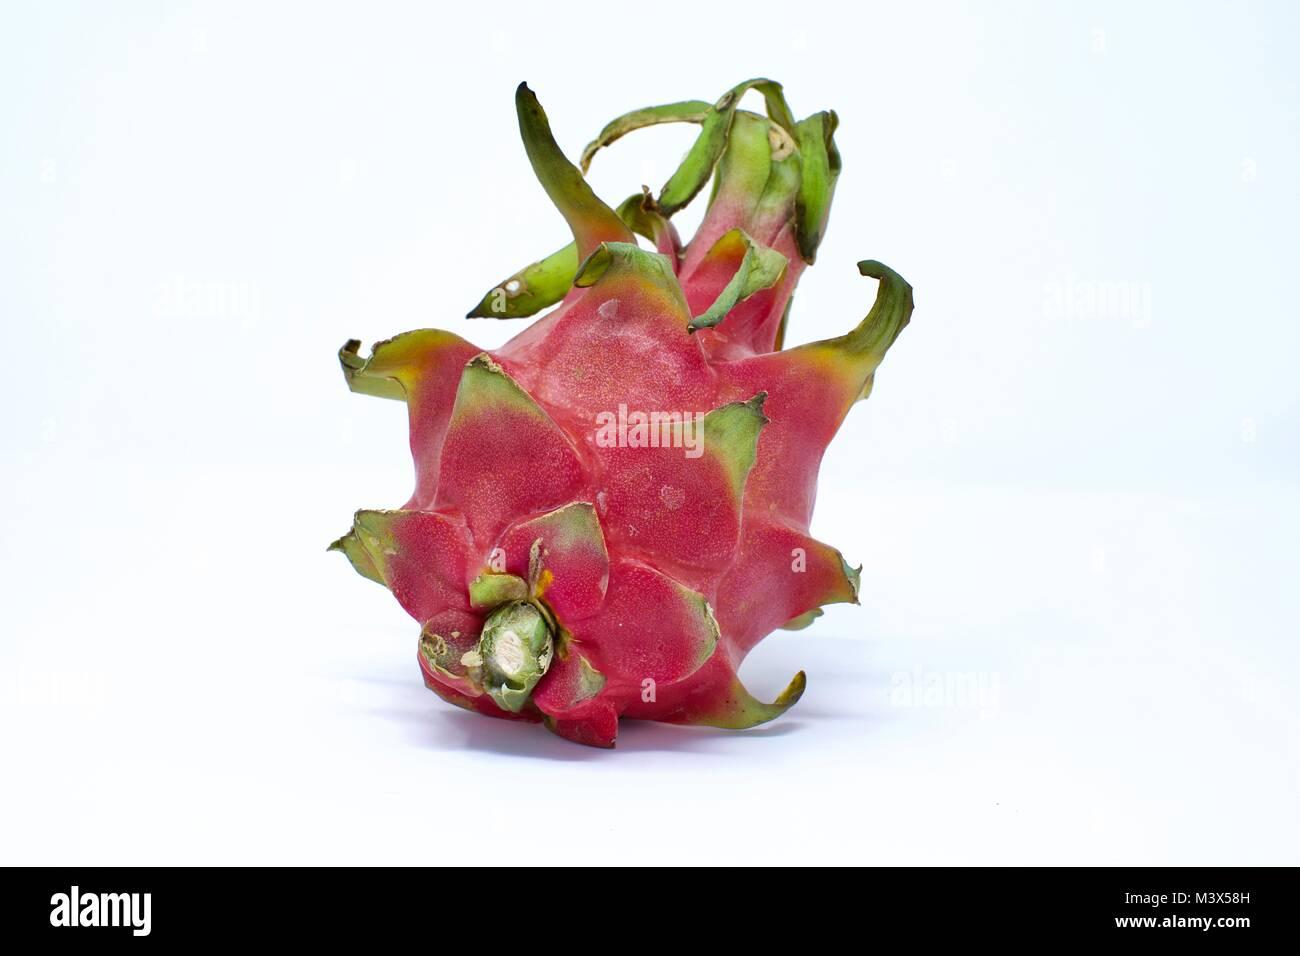 Dragon fruit (Hylocereus undatus) on a white background - Stock Image